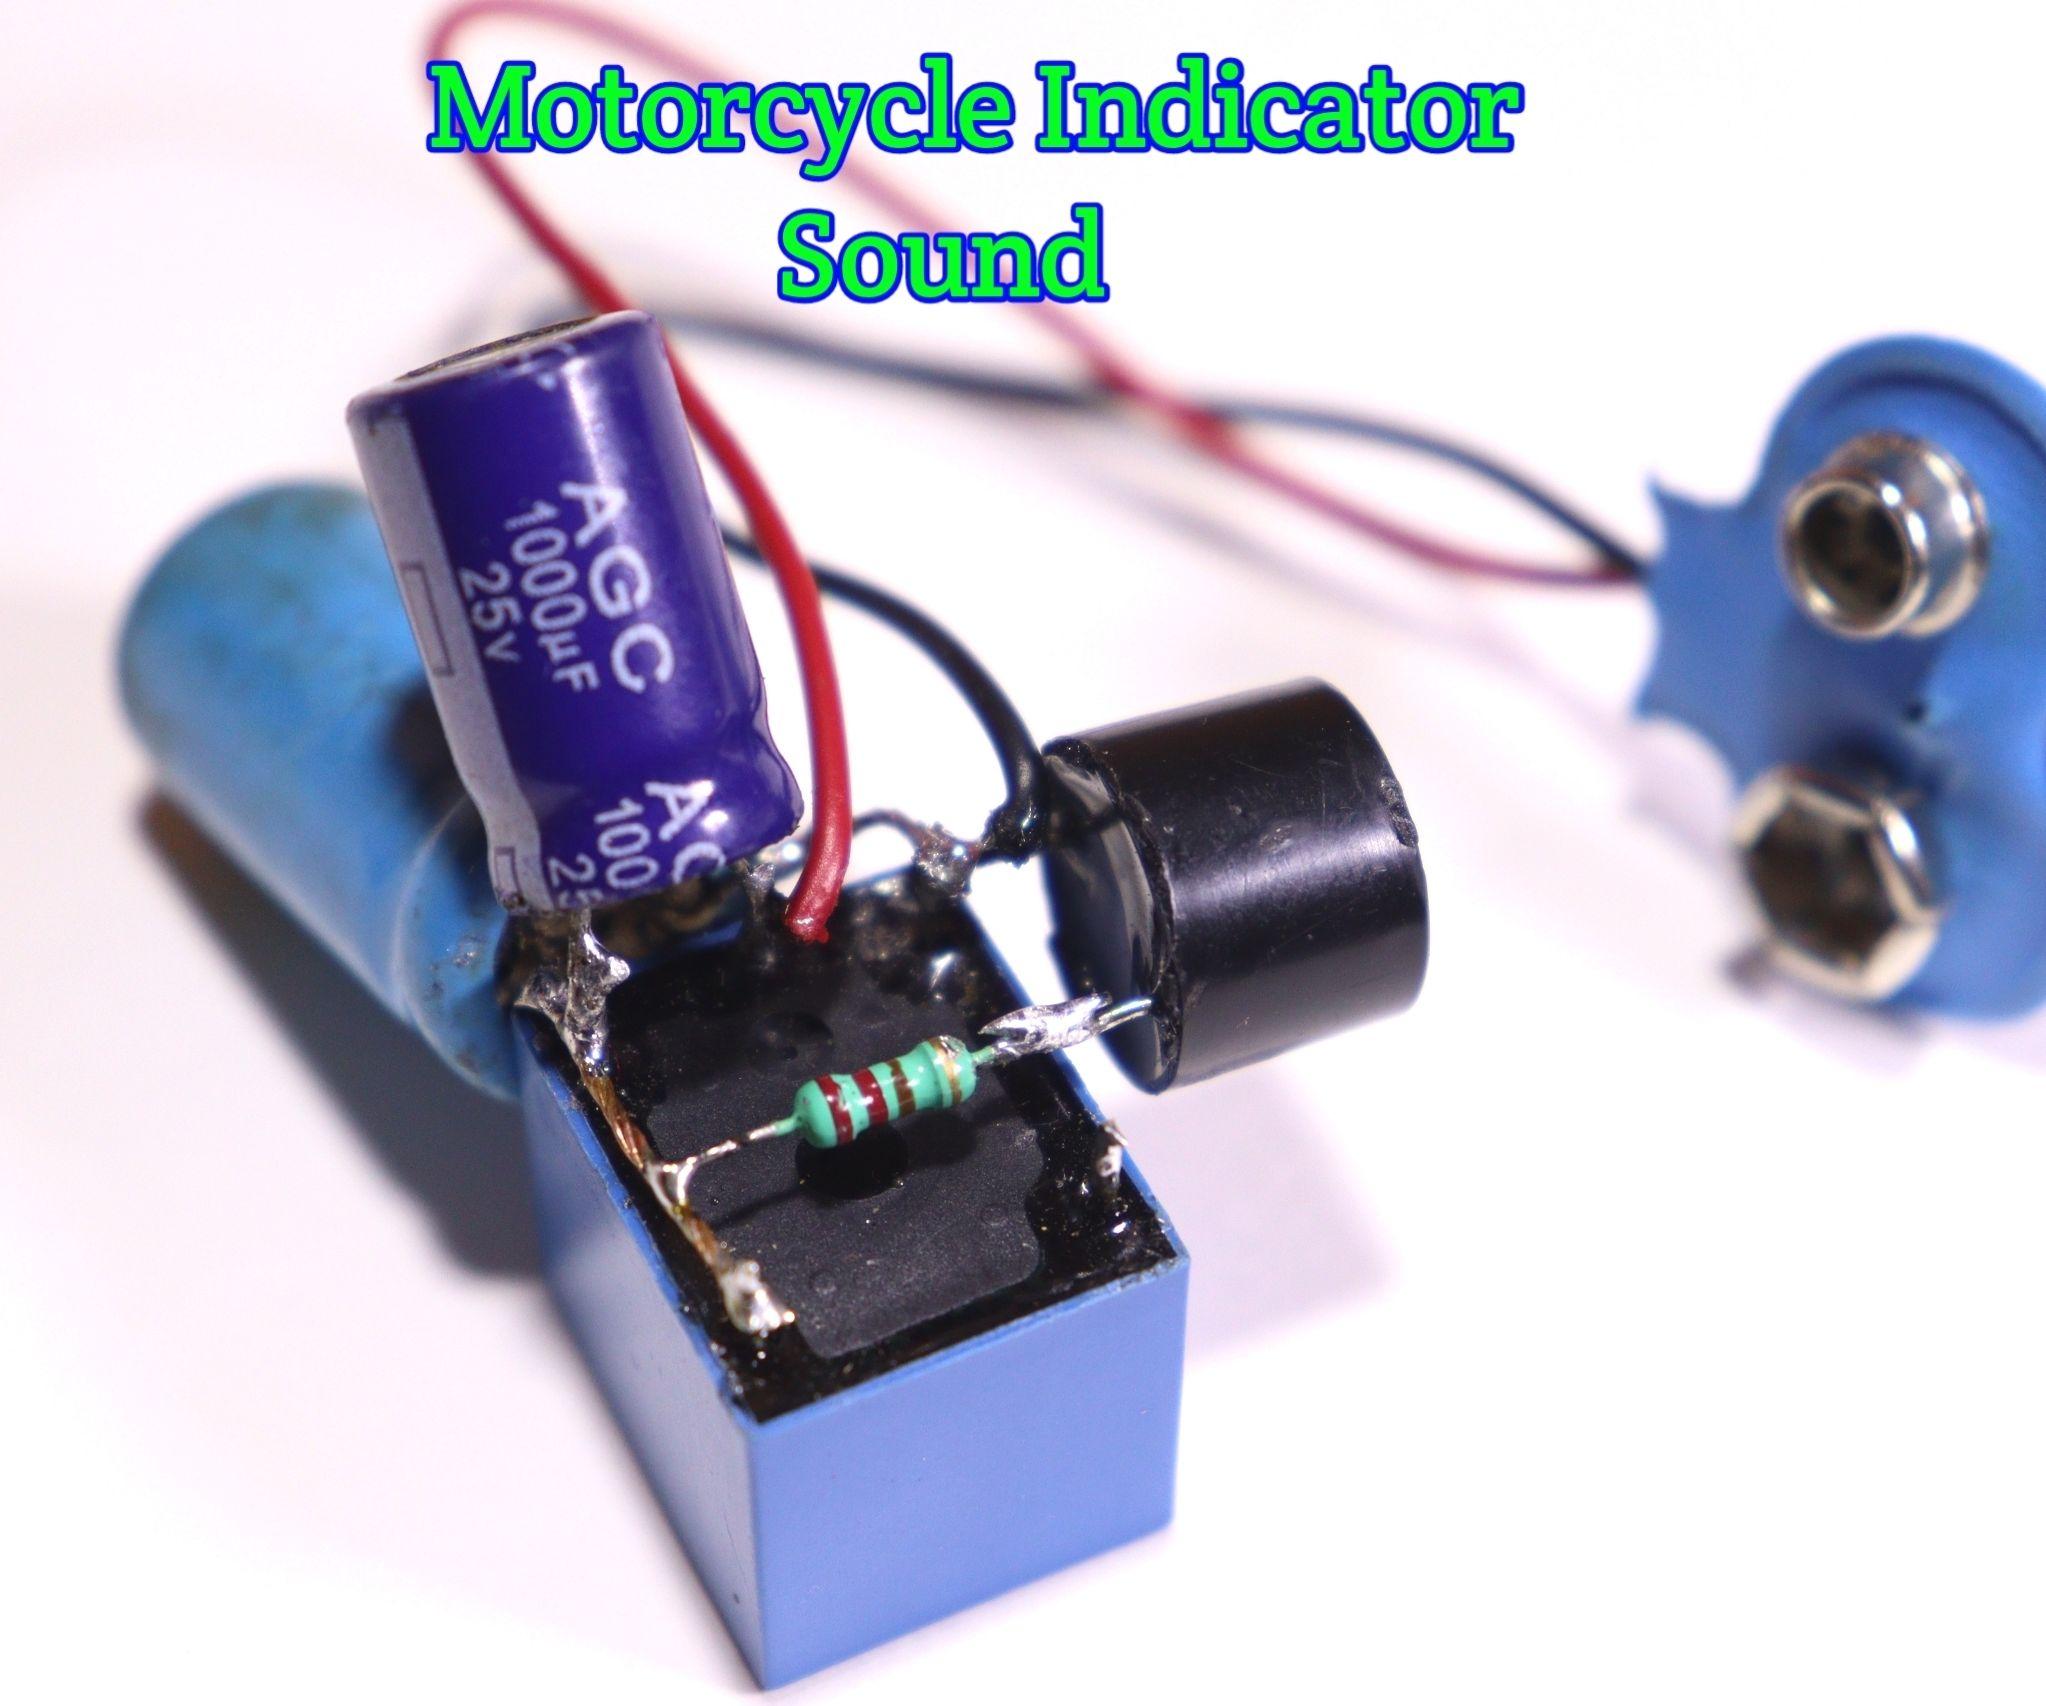 MotorCycle Indicator Sound Generator Using Relay